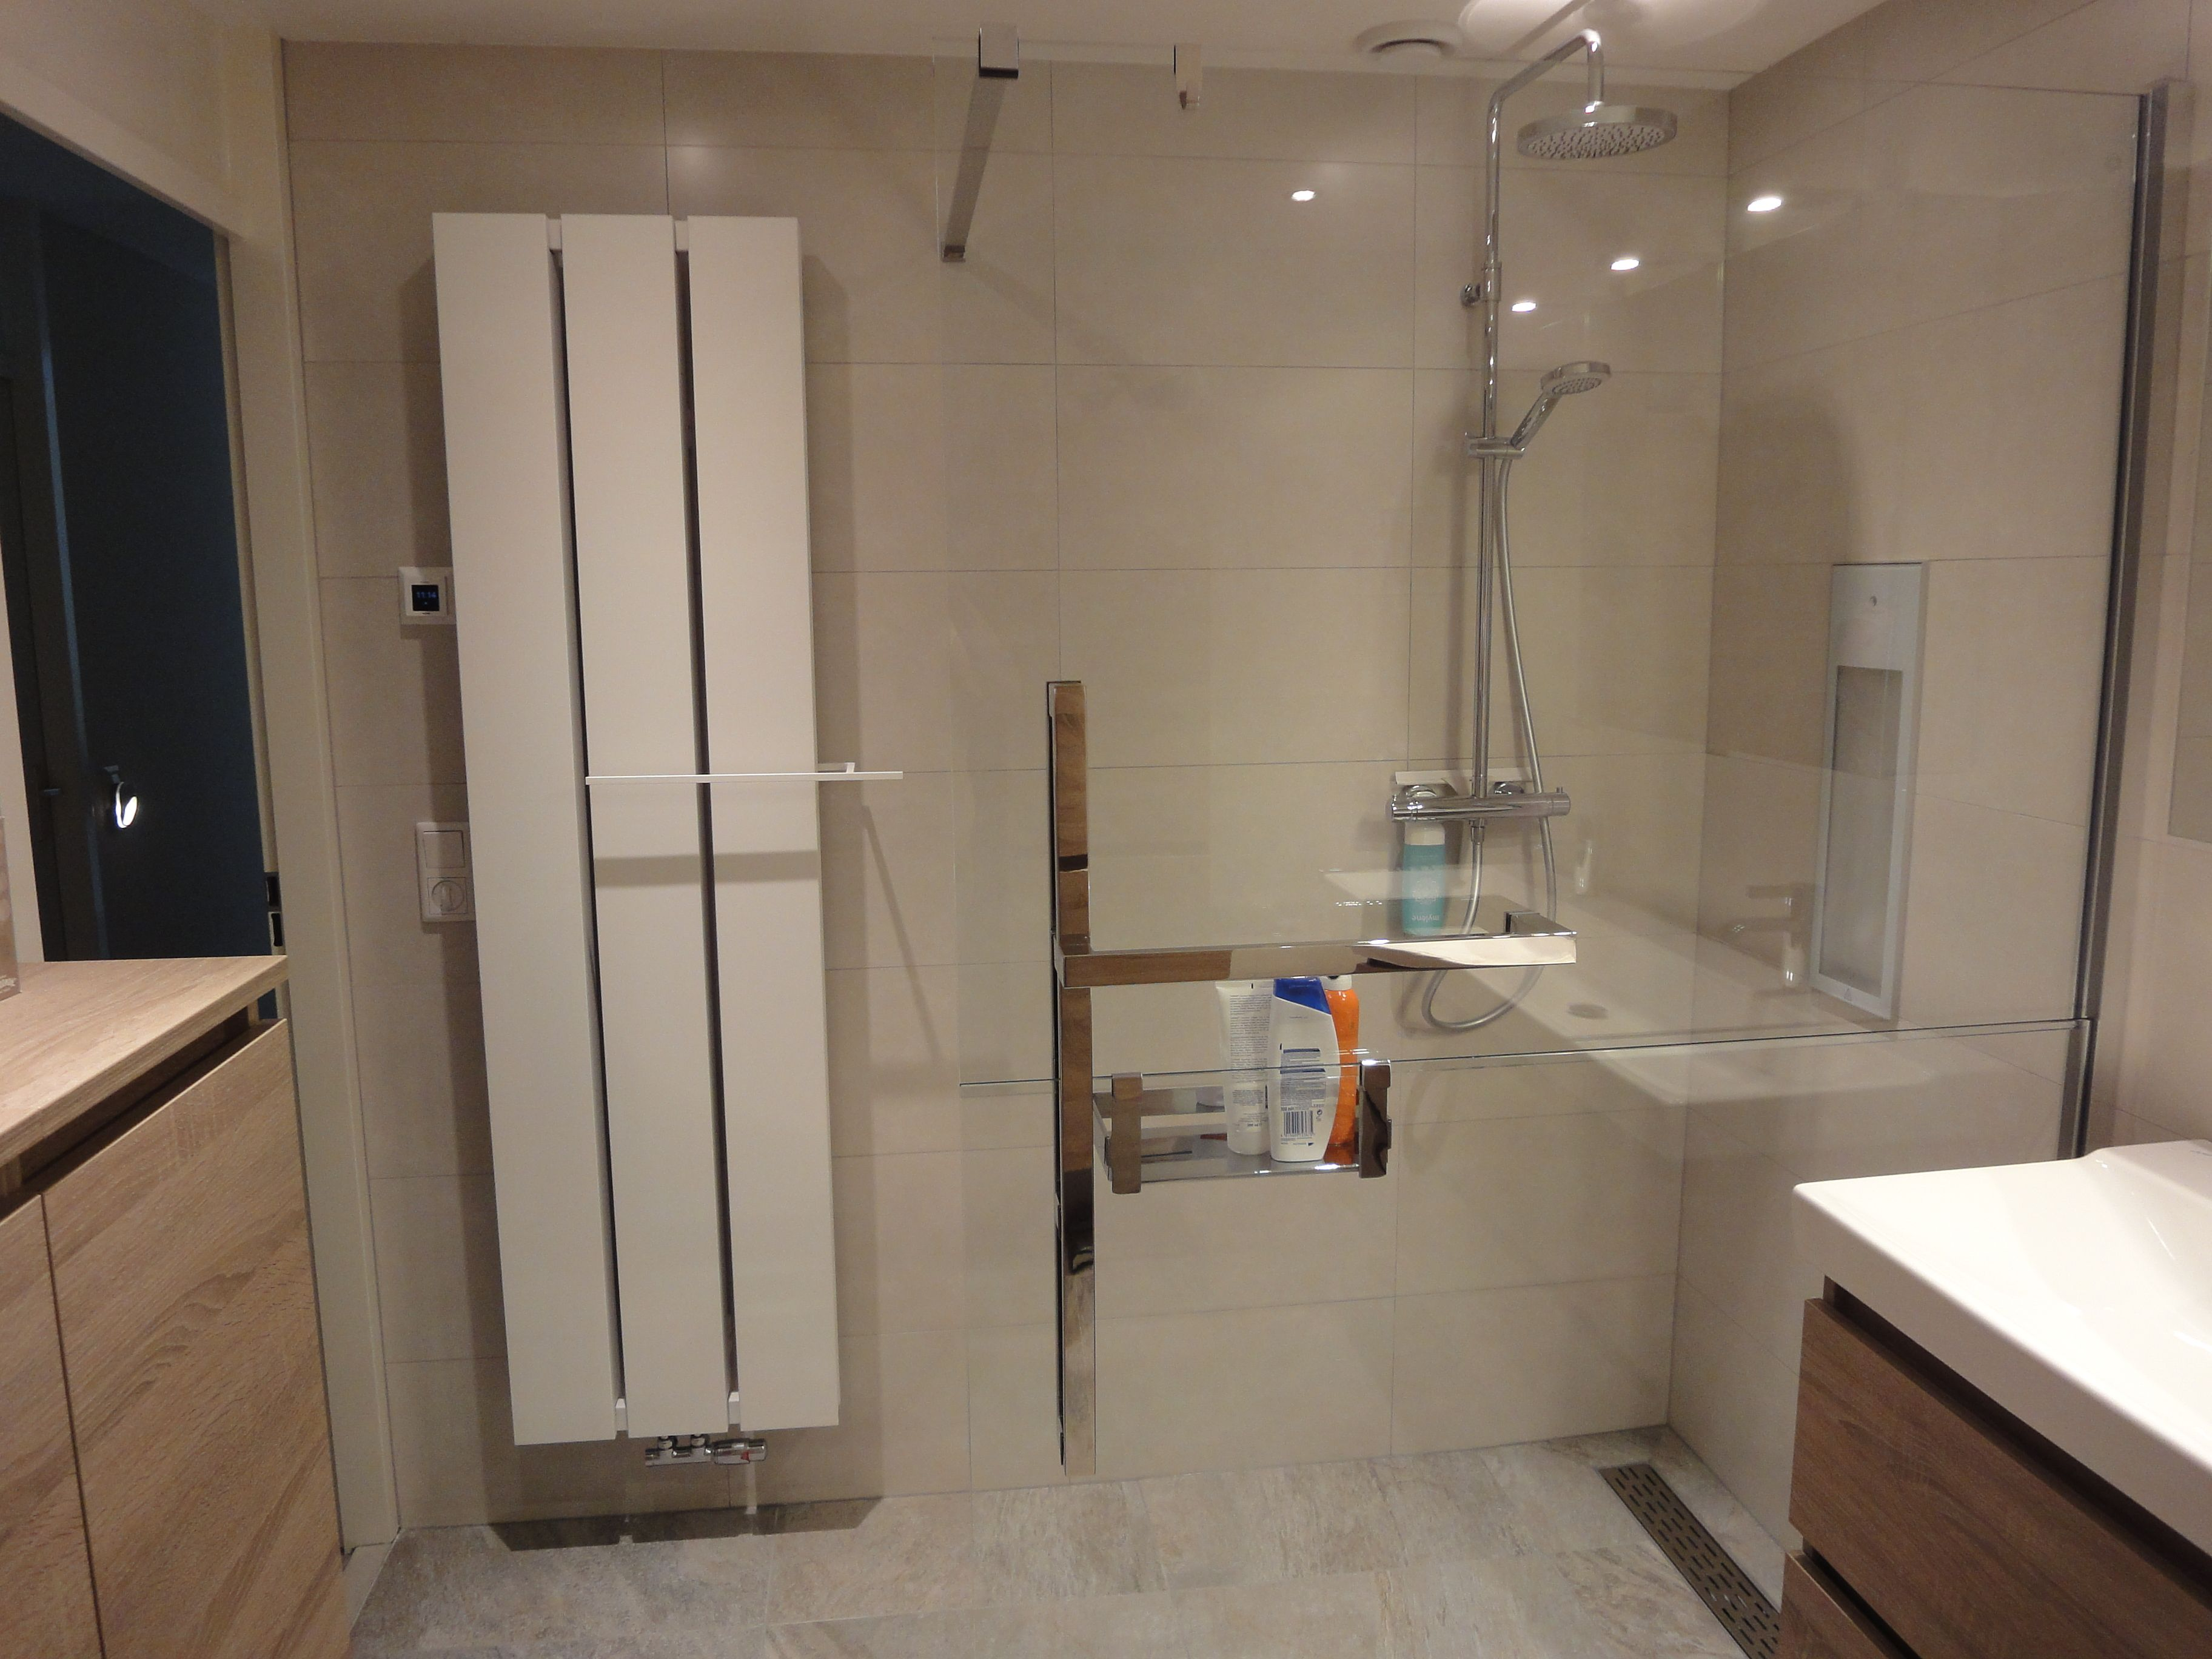 gerealiseerde badkamer door sanidrome thijssen uit deurne met o a